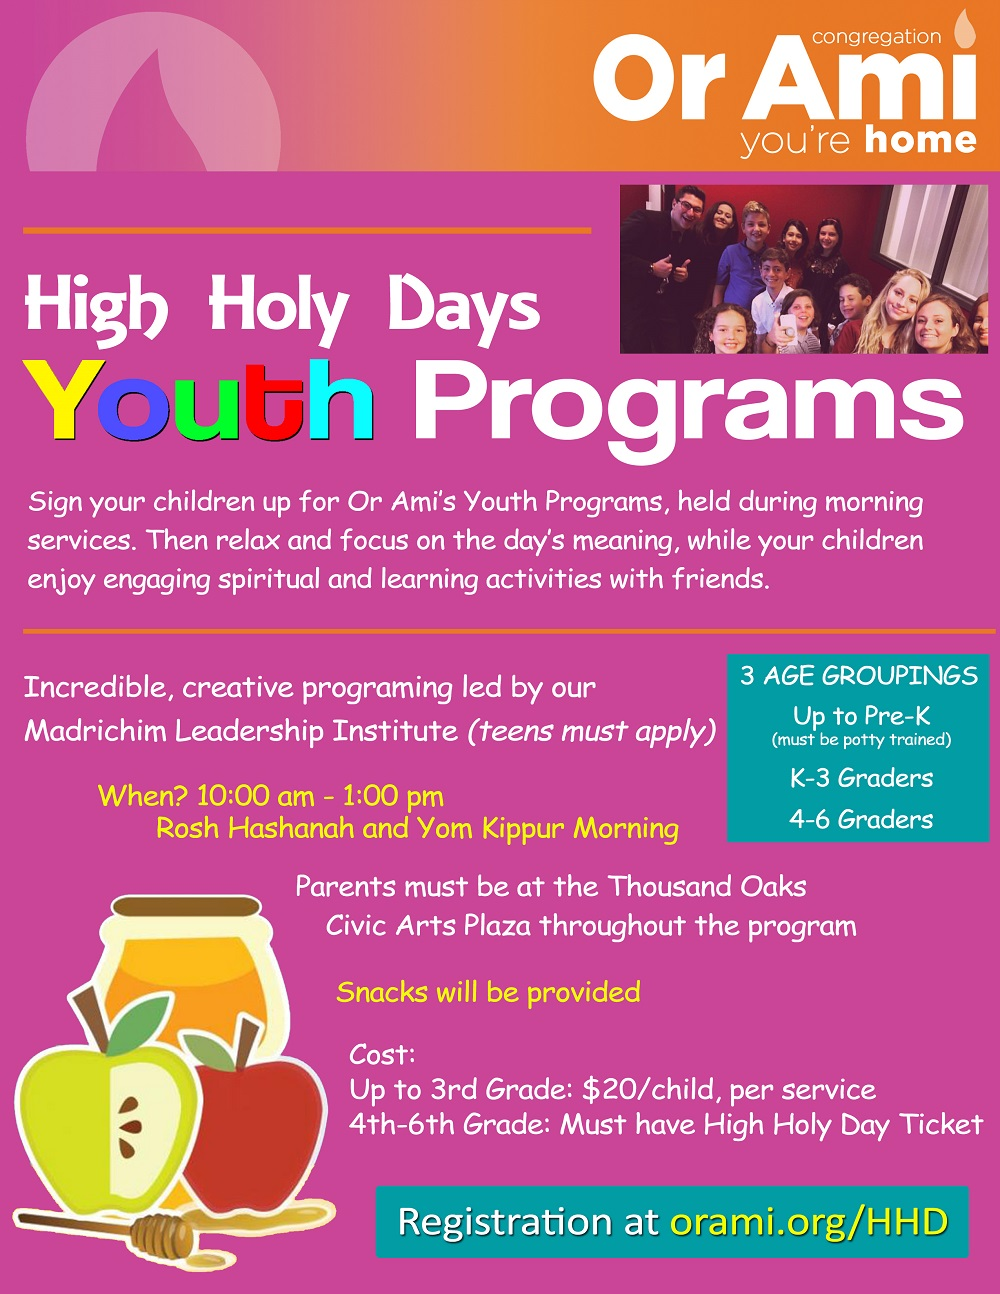 high holidays youth services or ami calabasas high holy days thumbnail 1